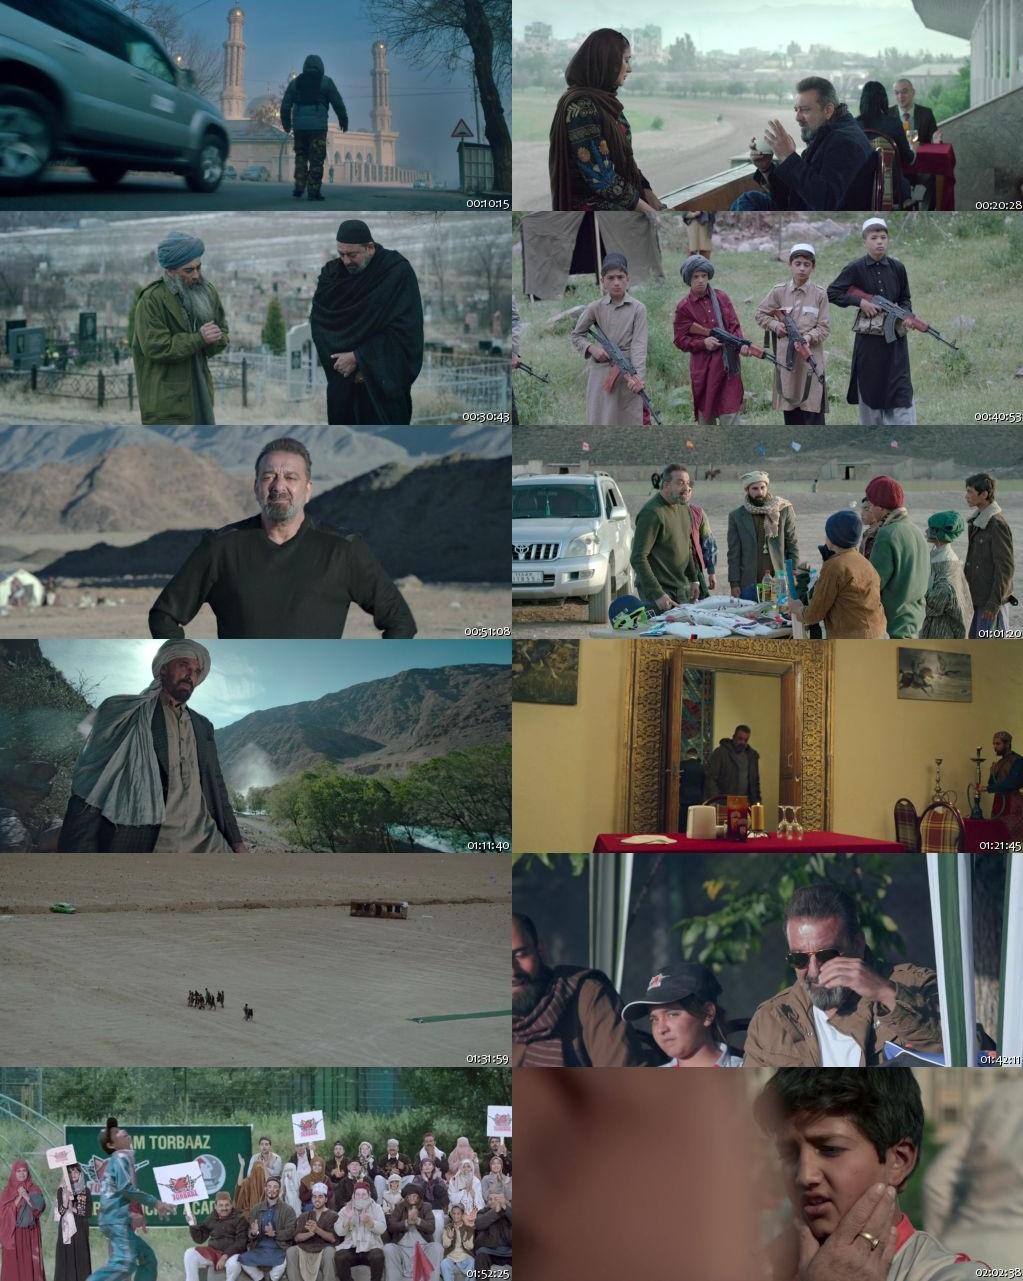 Torbaaz 2020 Full Hindi Movie Online Watch HDRip 720p Dual Audio